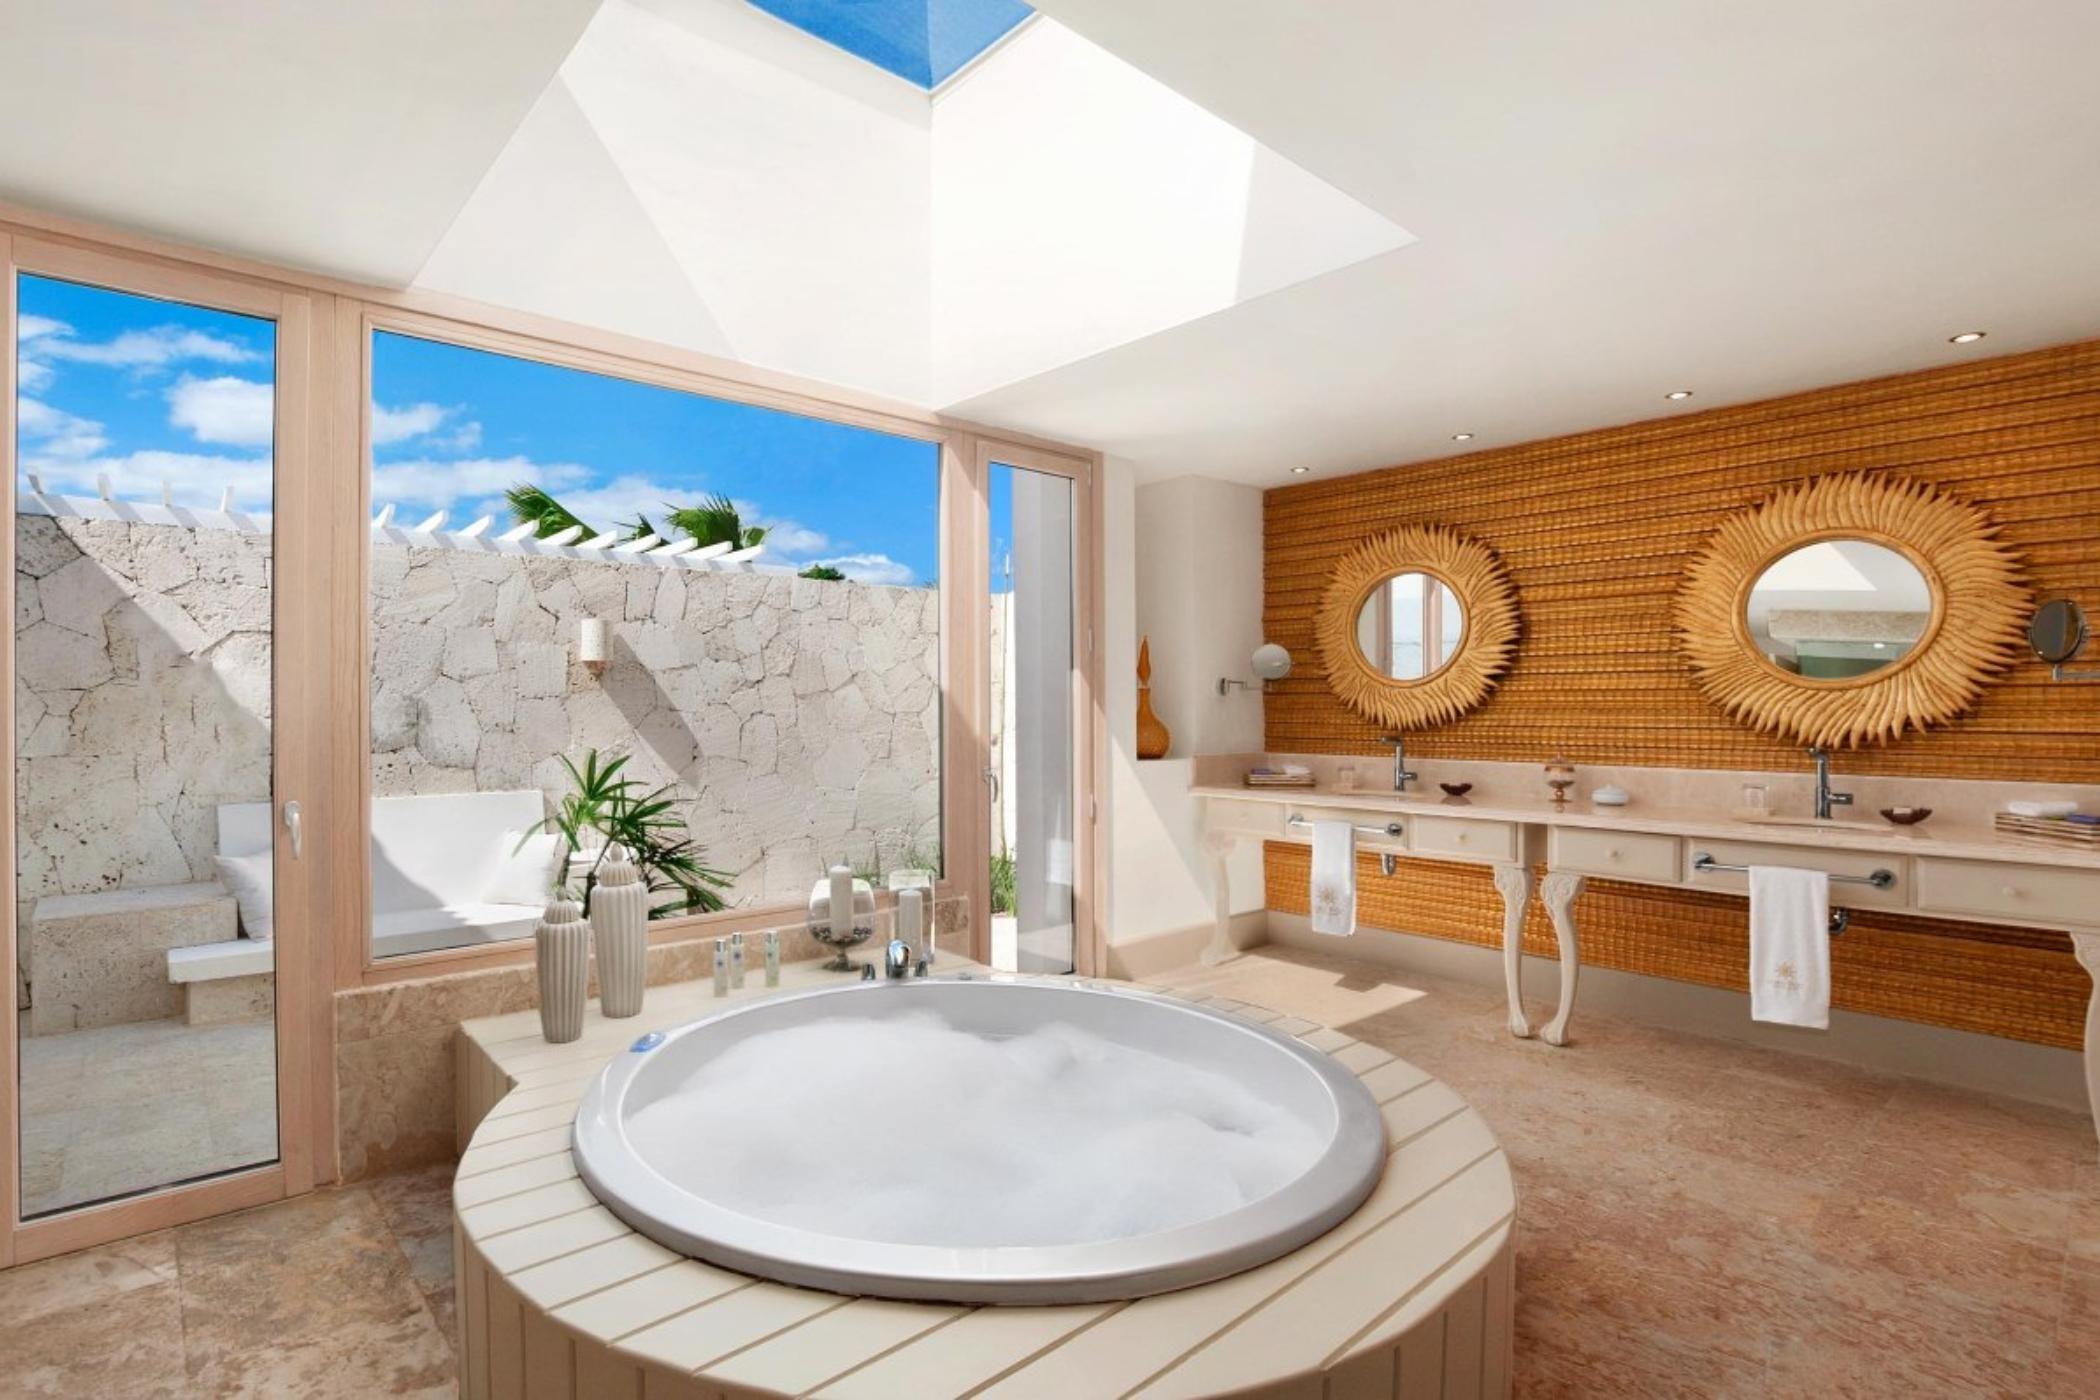 Coral Stone Bathtub With Marble Jacuzzi Luxury Bathroom Bathroom Styling Indoor Jacuzzi